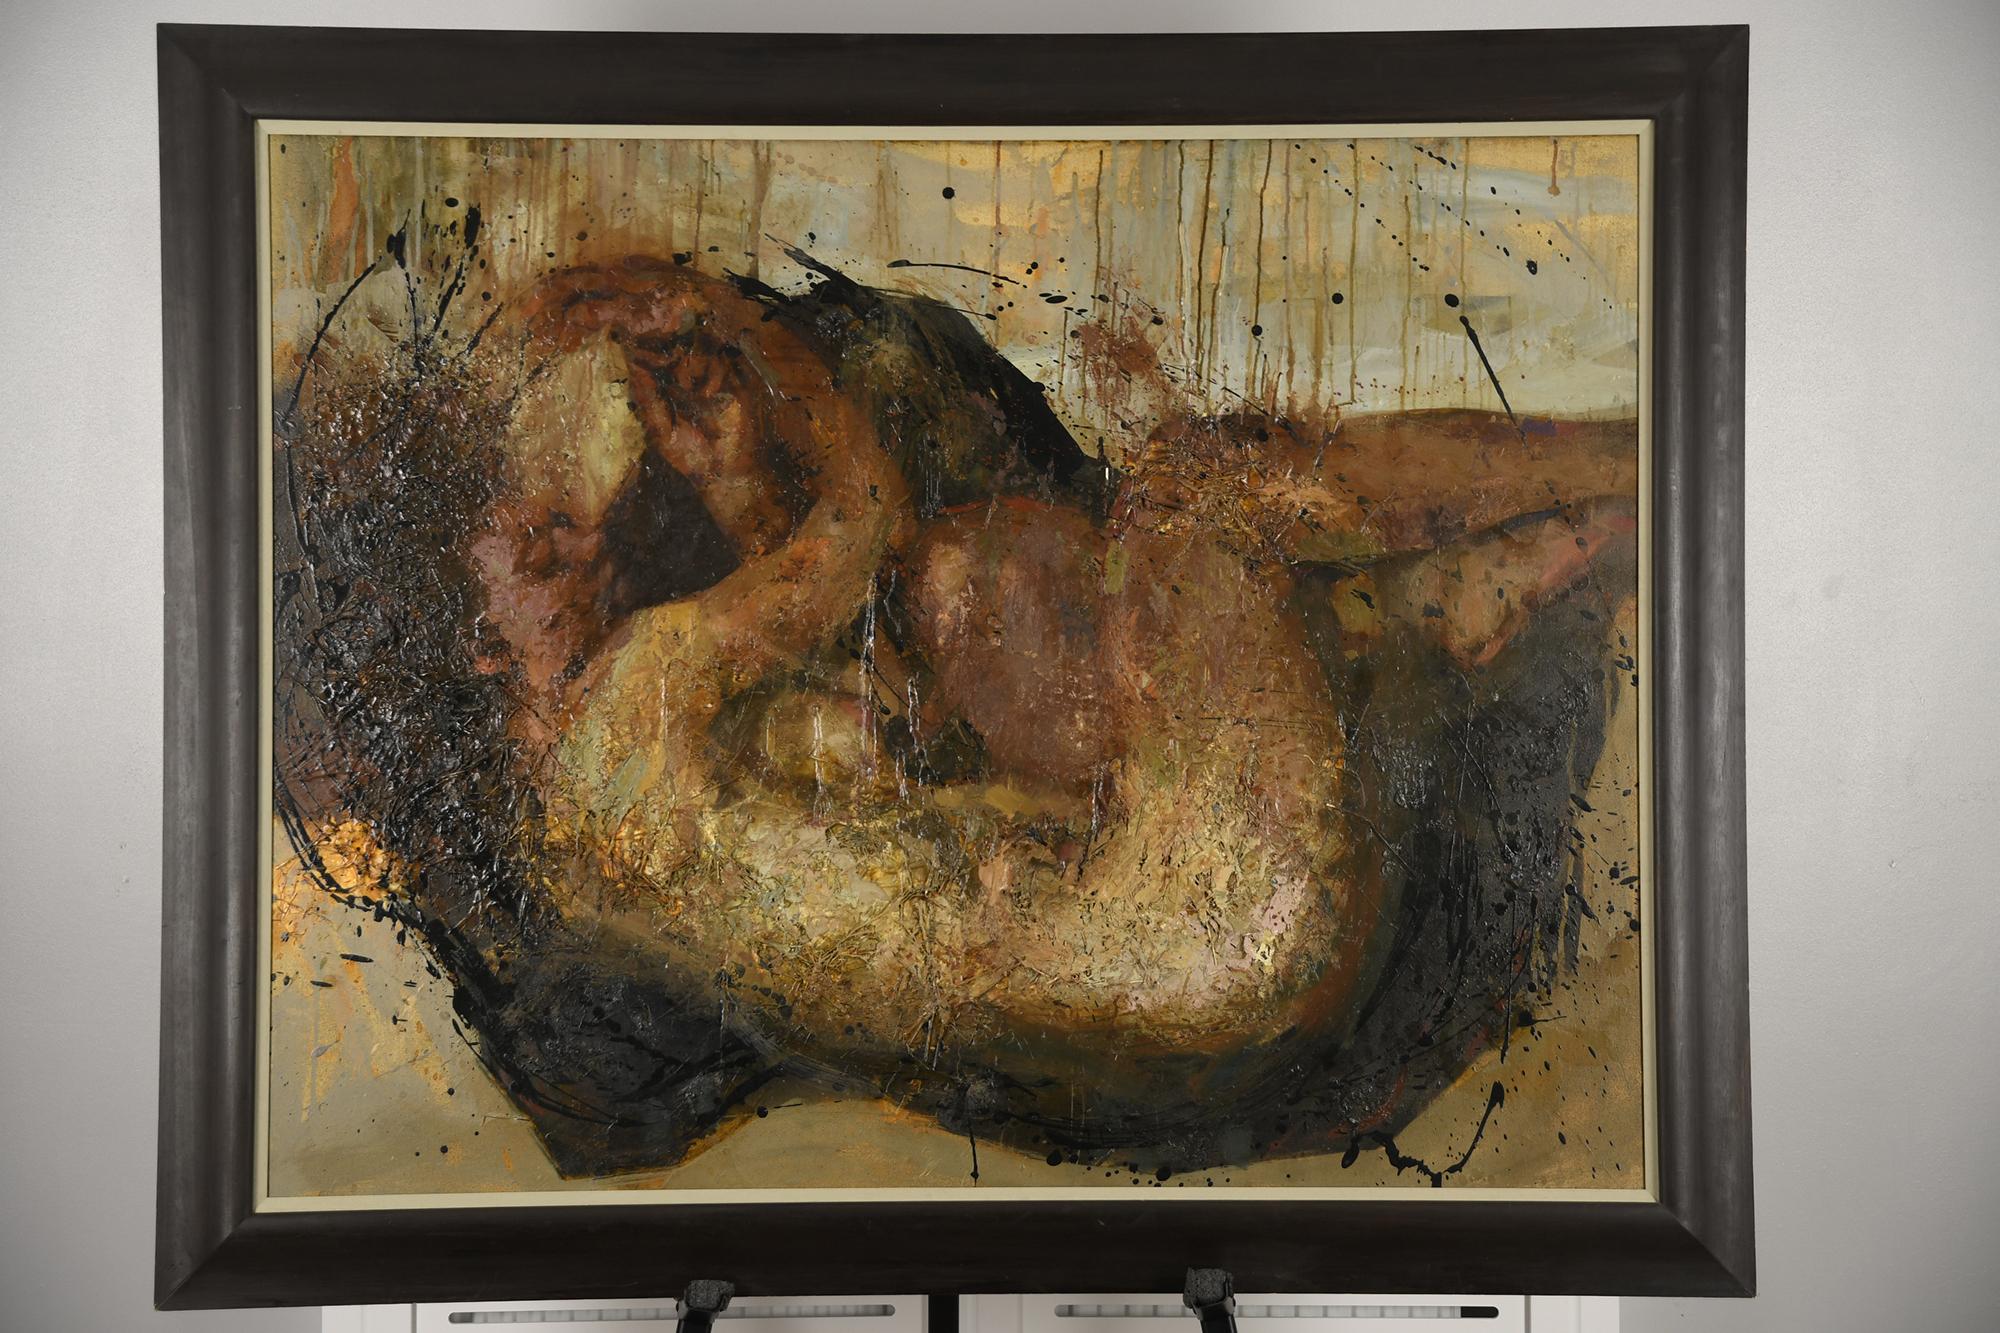 Stunning Original Painting by Renowned Scottish artist Alan McGowan. - Image 5 of 22